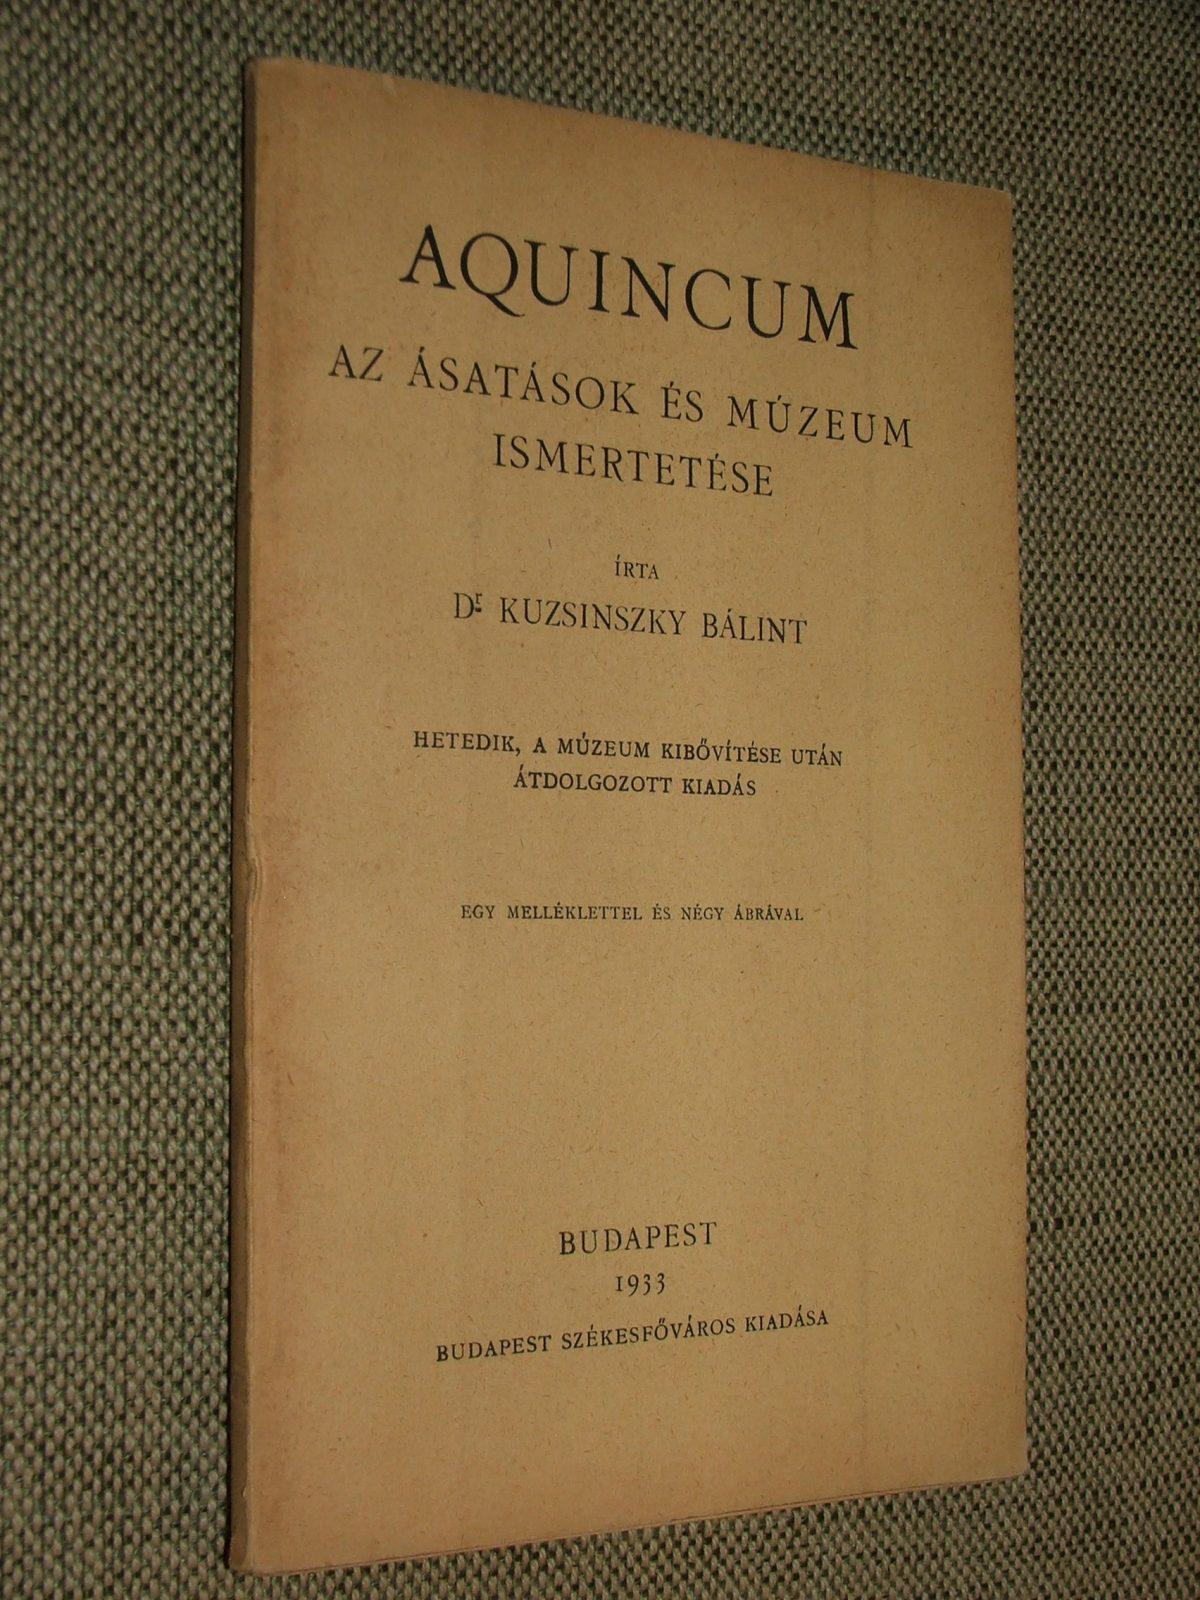 KUZSINSZKY Bálint: Aquincum